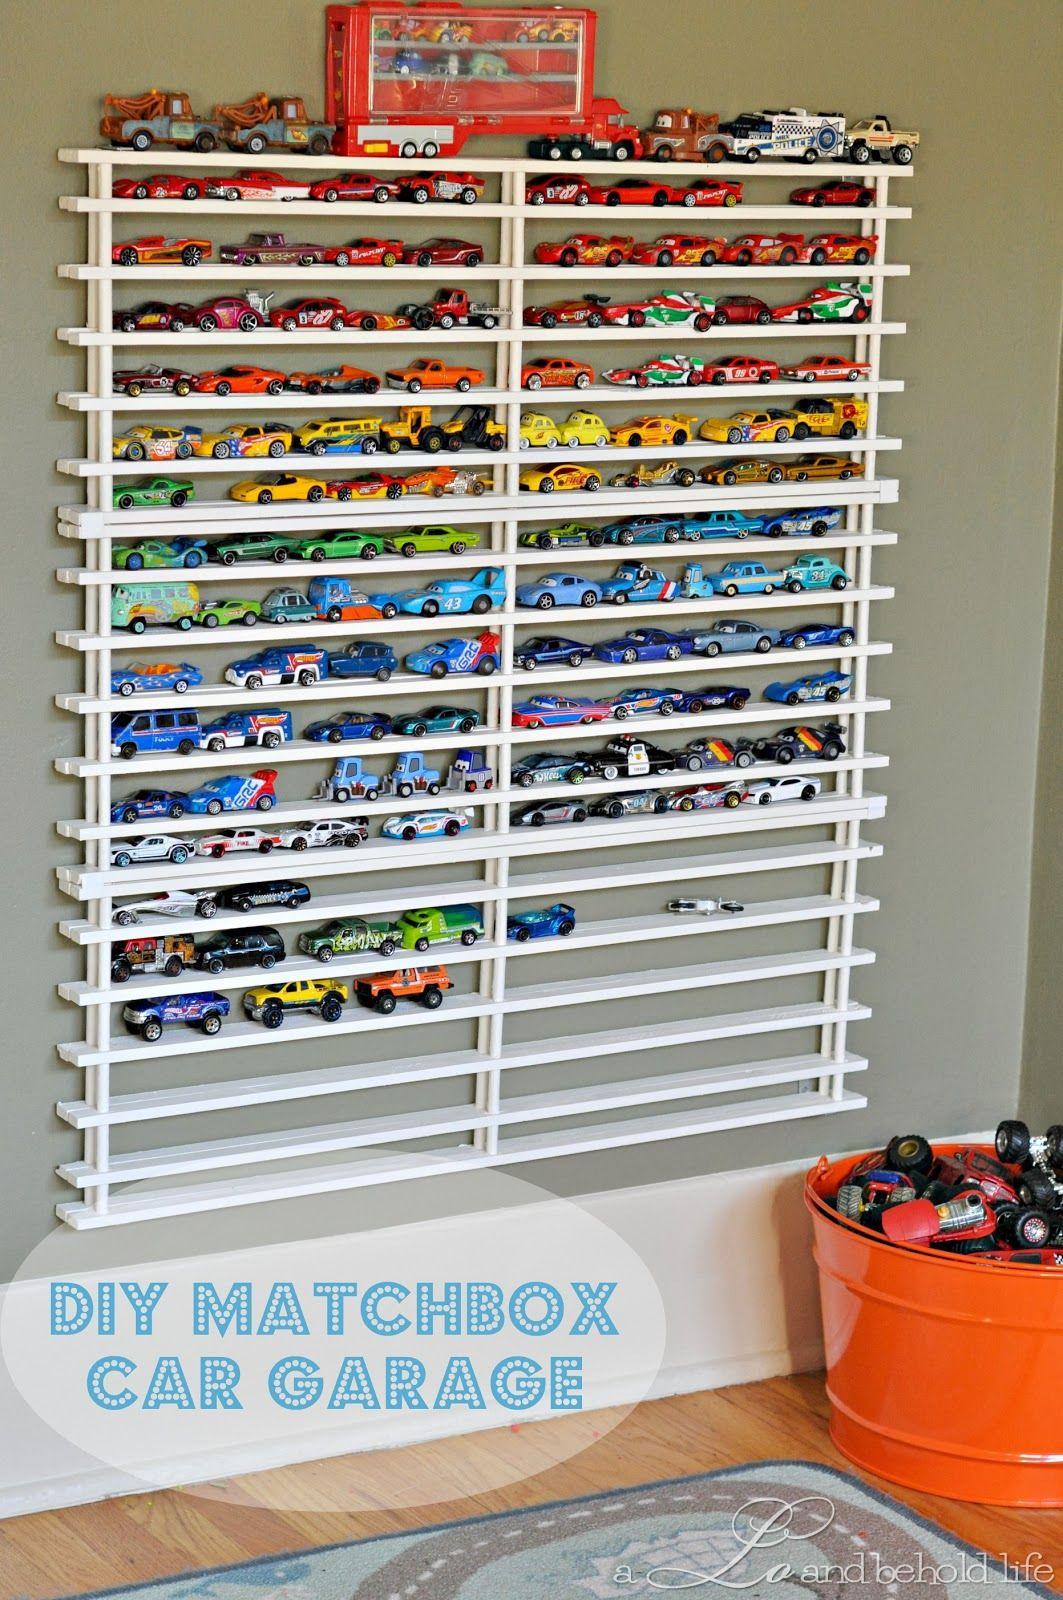 15 Fun Ideas Just For Kids Onekriegerchick Kids Room Organization Playroom Storage Organization Kids